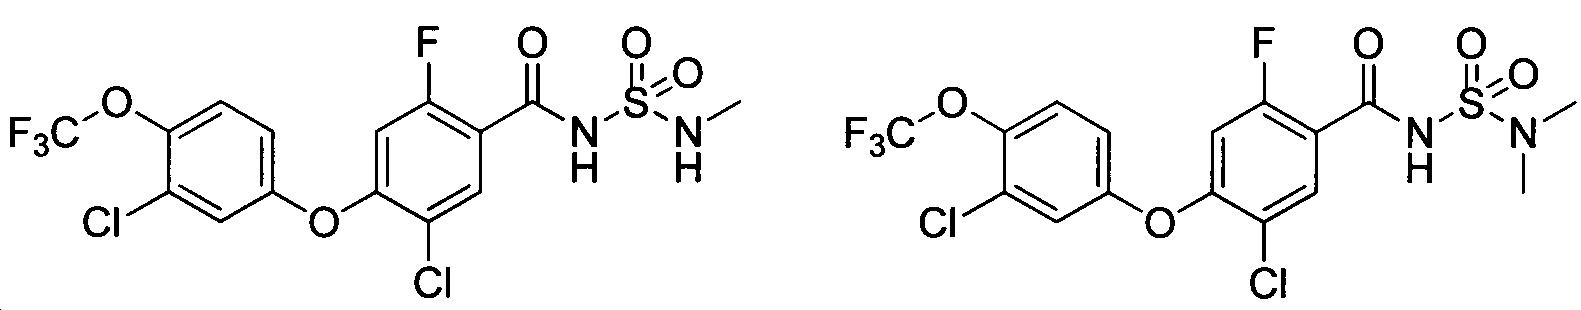 Figure 112015011690175-pct00080